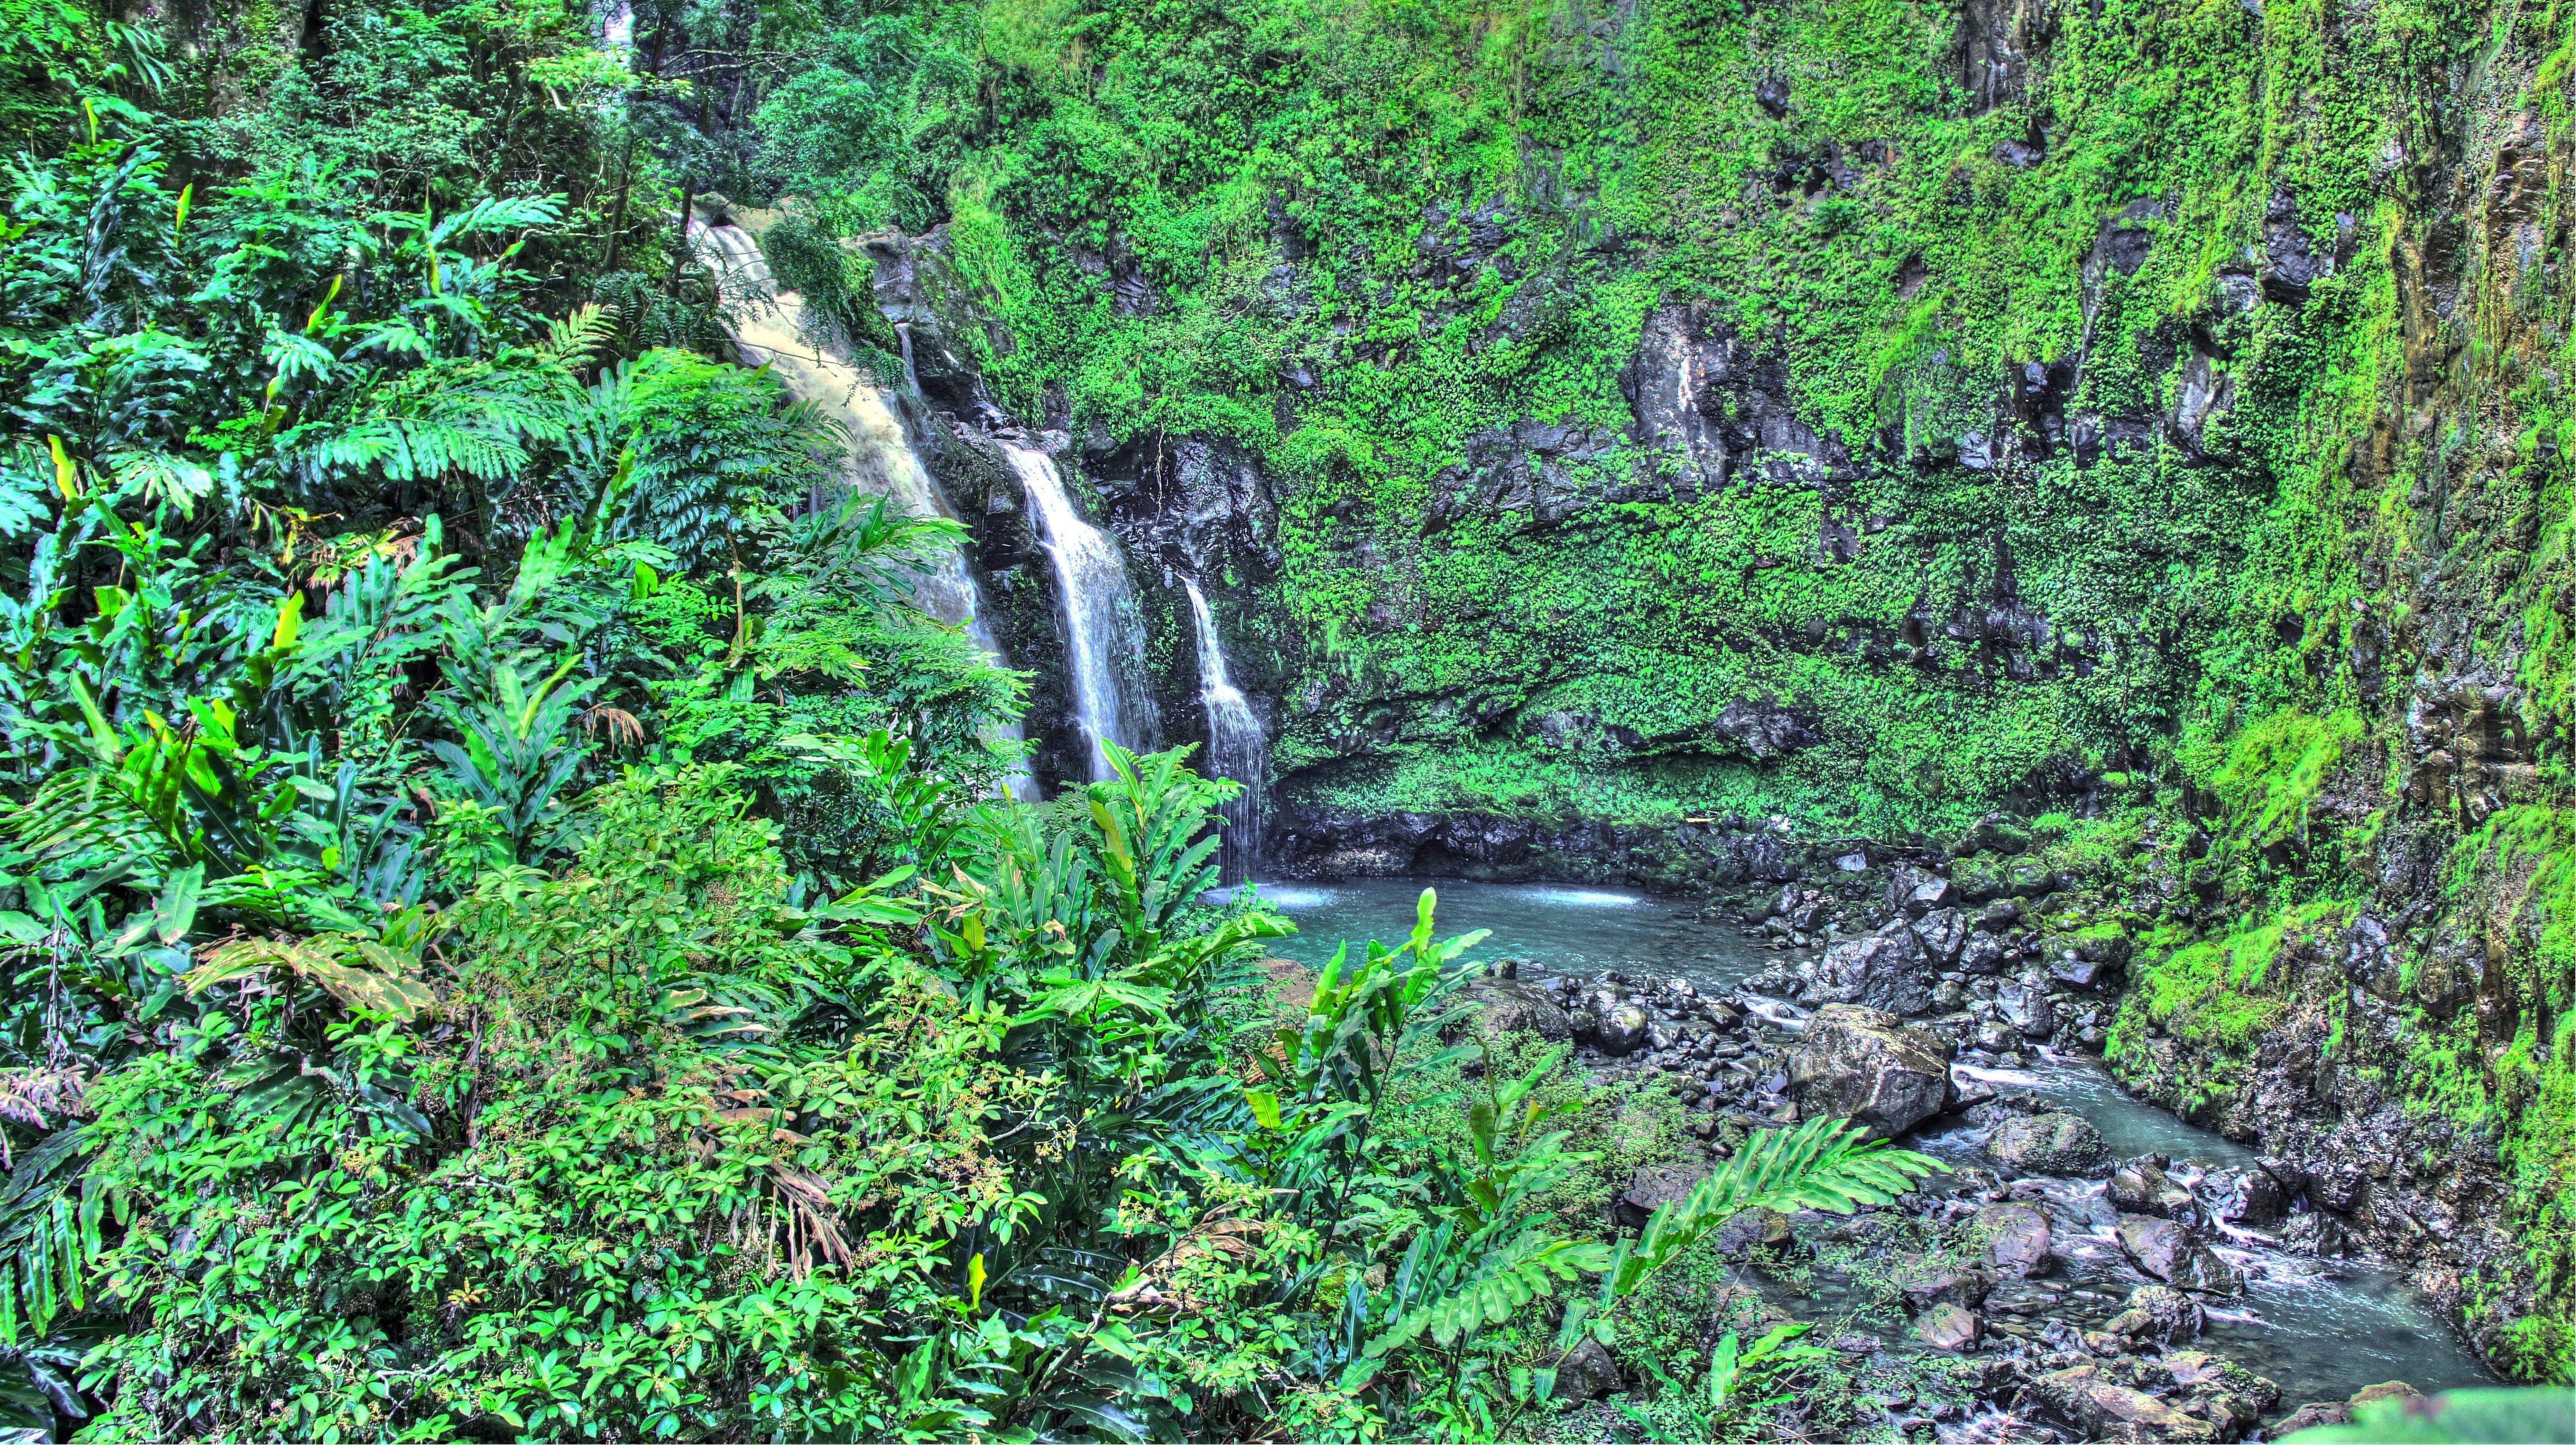 Wallpaper Waterfall Beach Palm Trees Jungle Stream